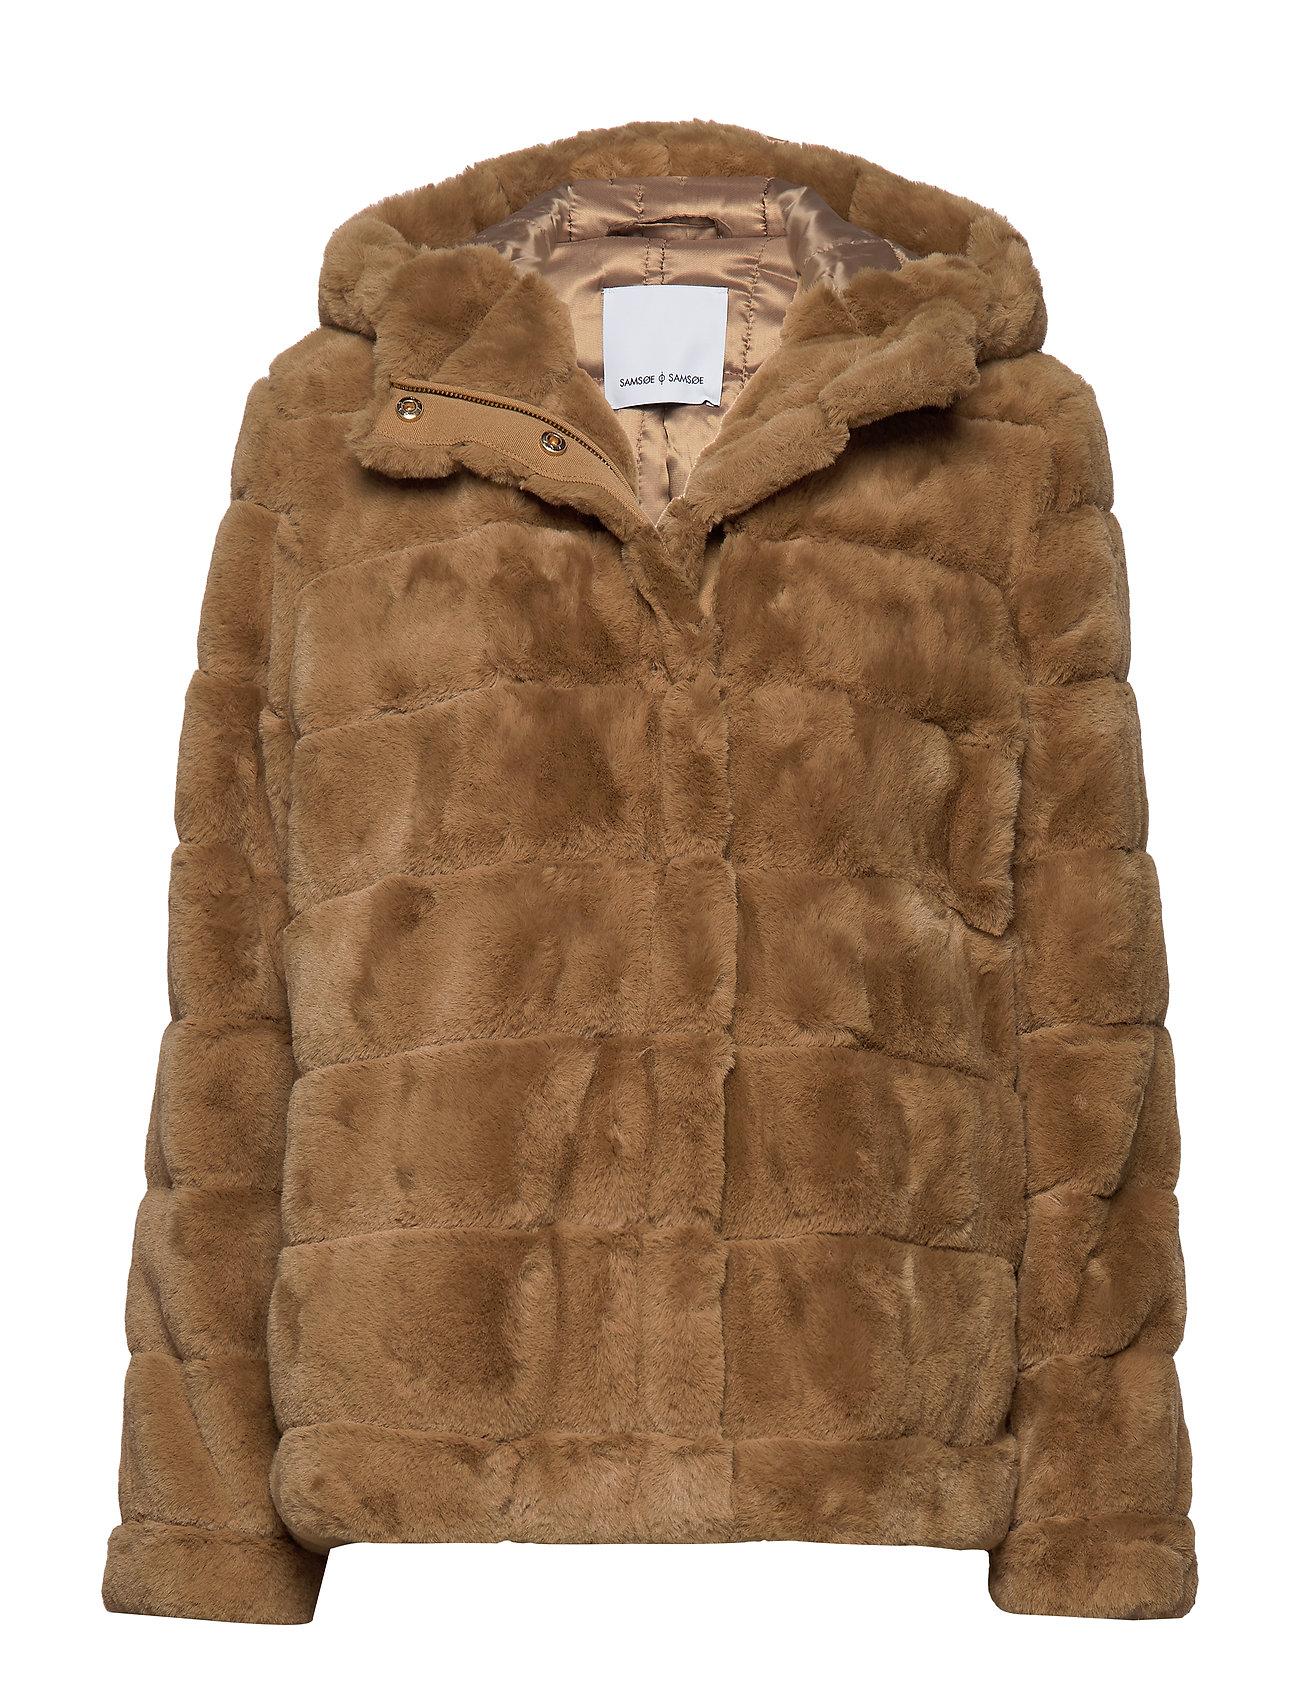 Samsøe & Samsøe Saba jacket 7309 - KHAKI